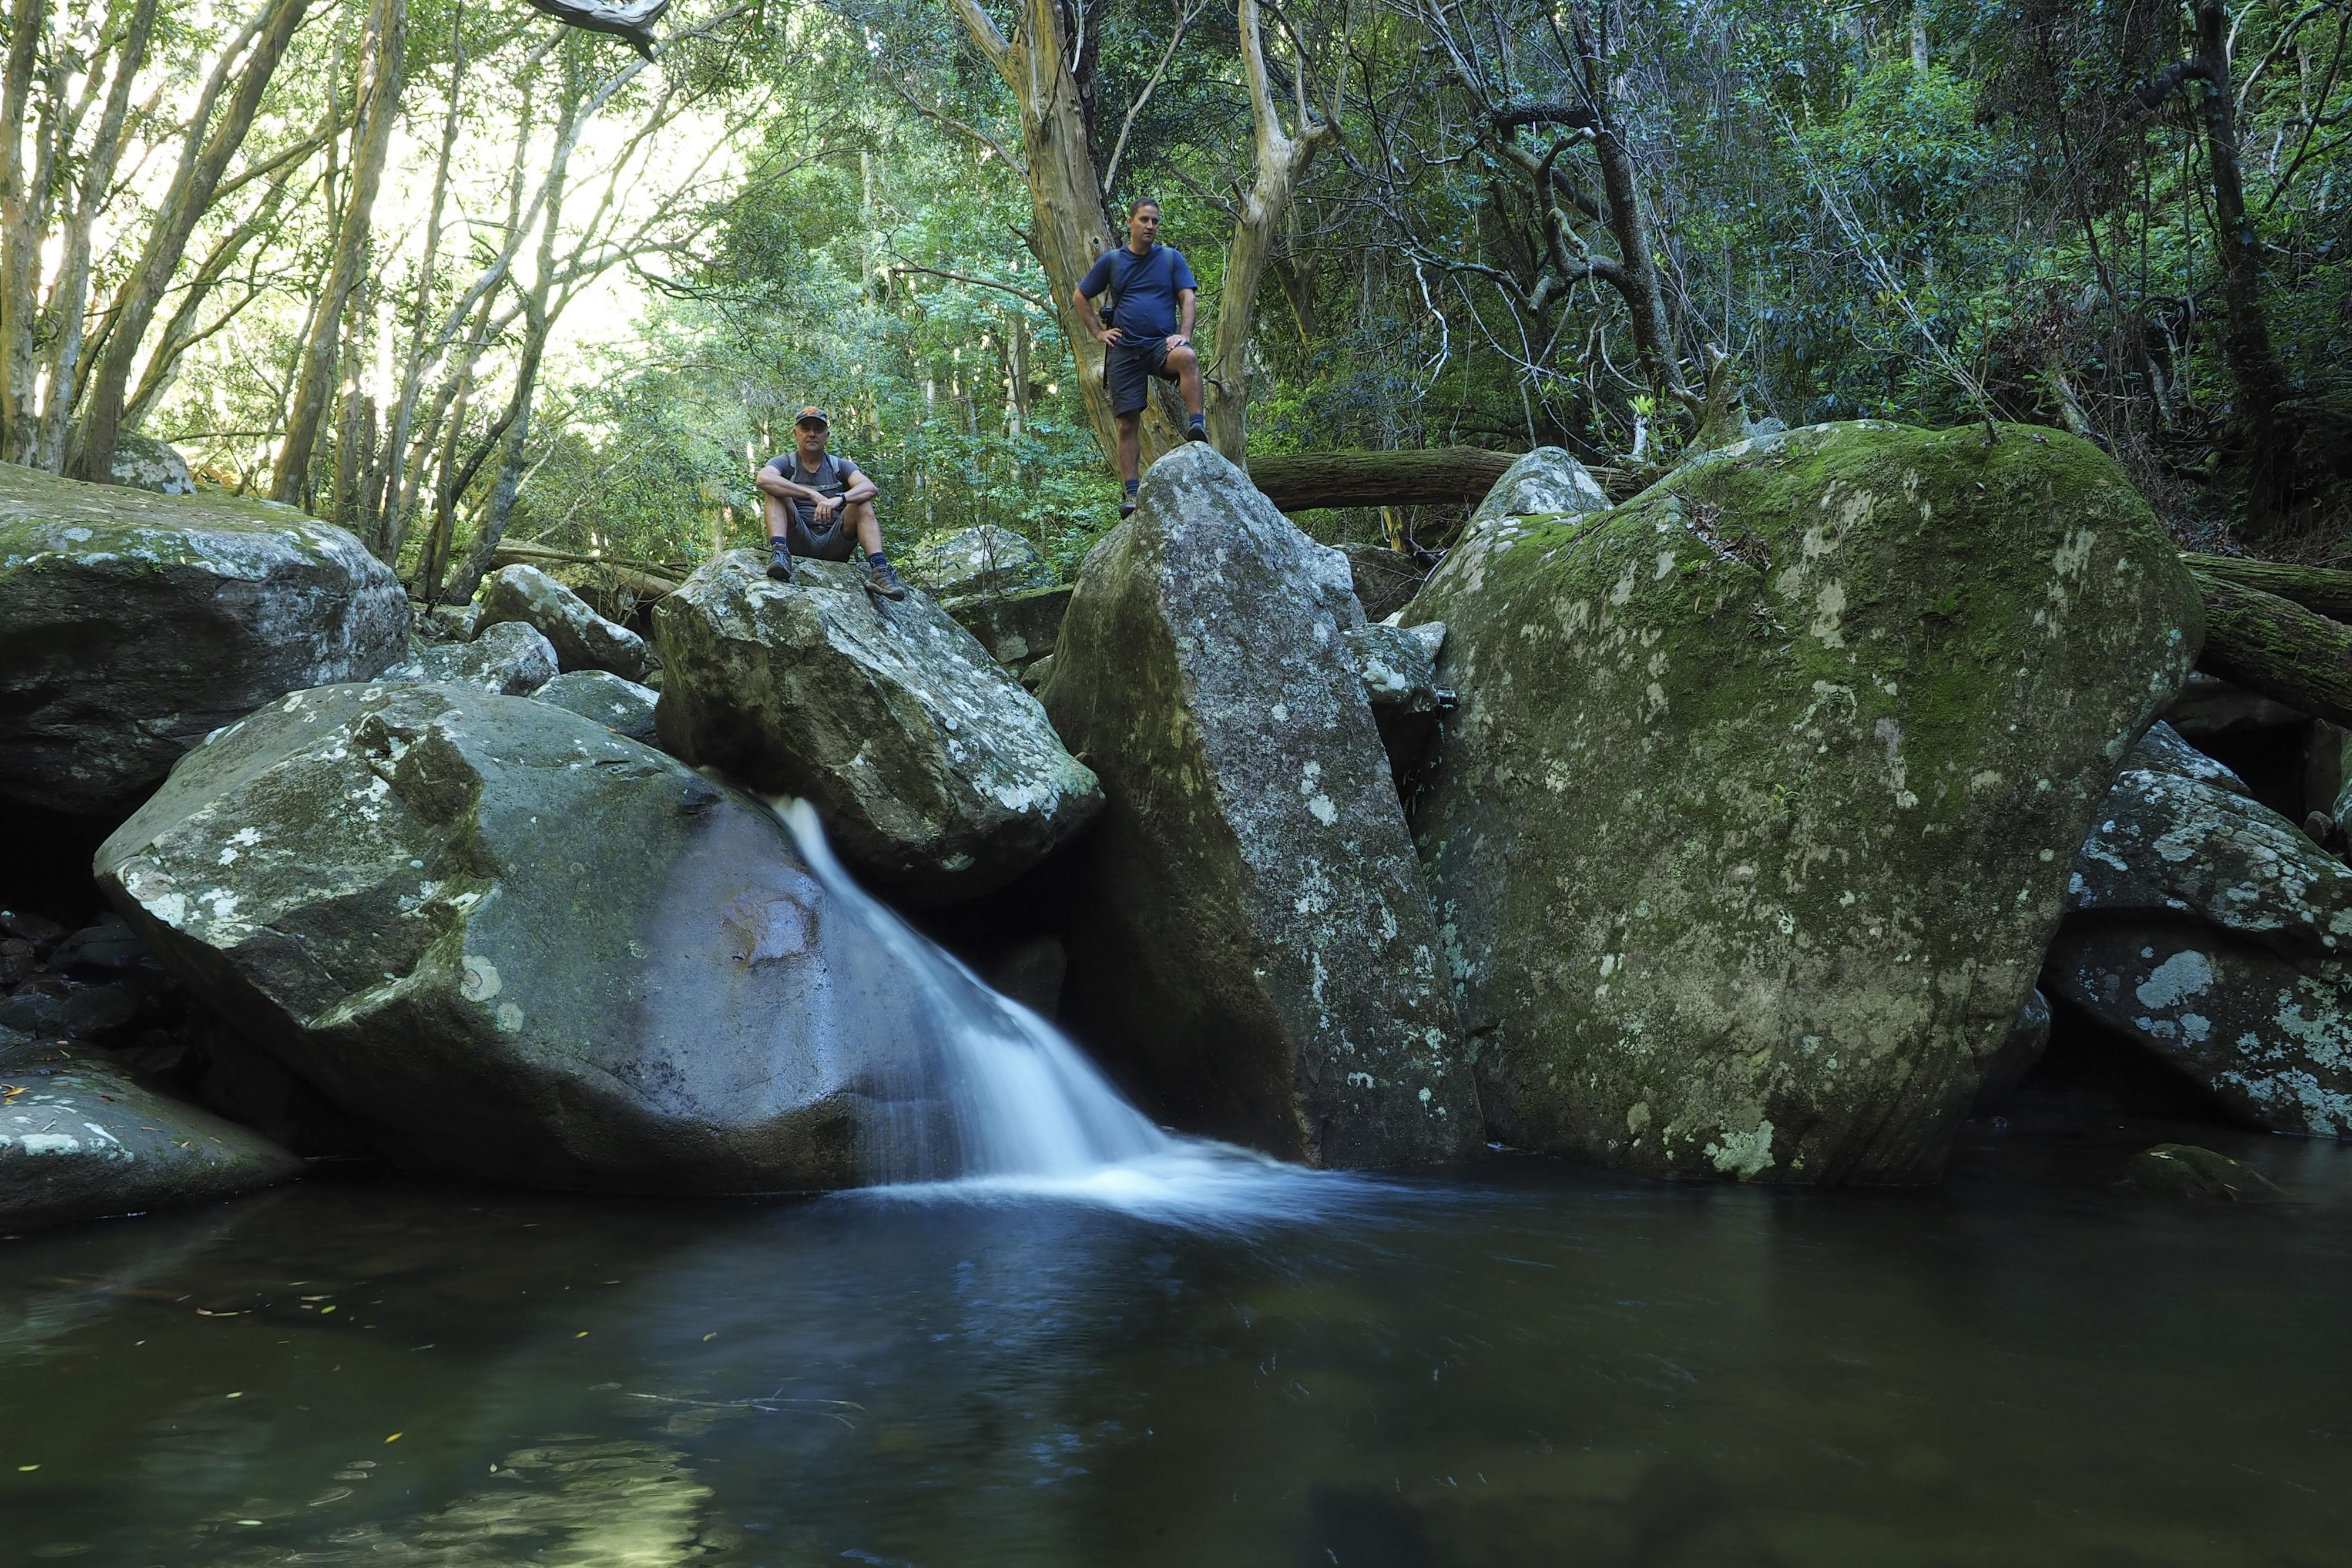 Wodi Wodi trail